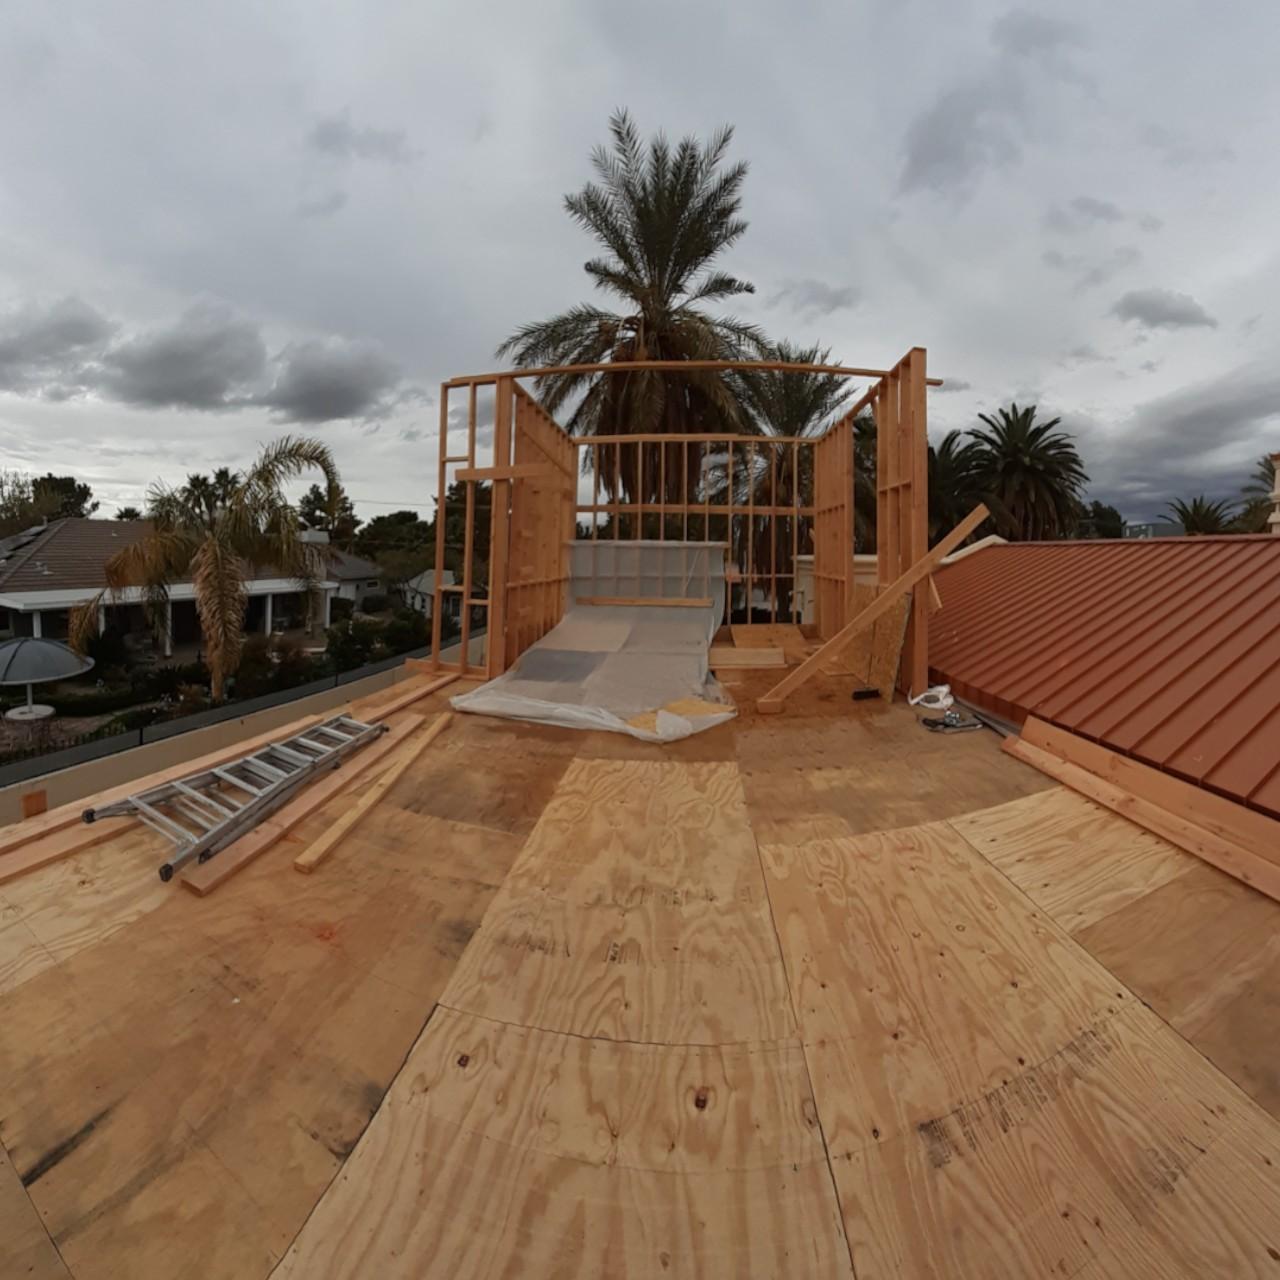 carpentry-wood-framing-second-floor-home-addition--framing-82